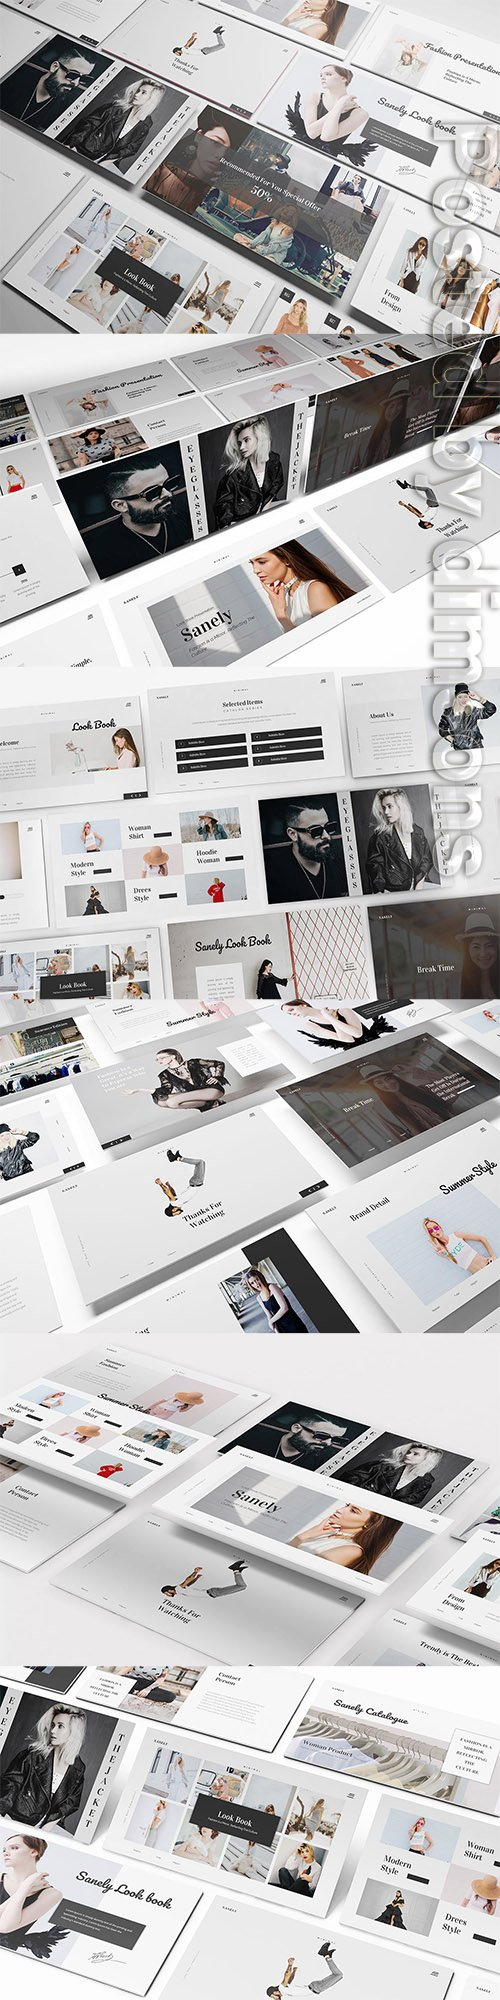 Fashion lookbook Powerpoint, Keynote and Google Slides Templates